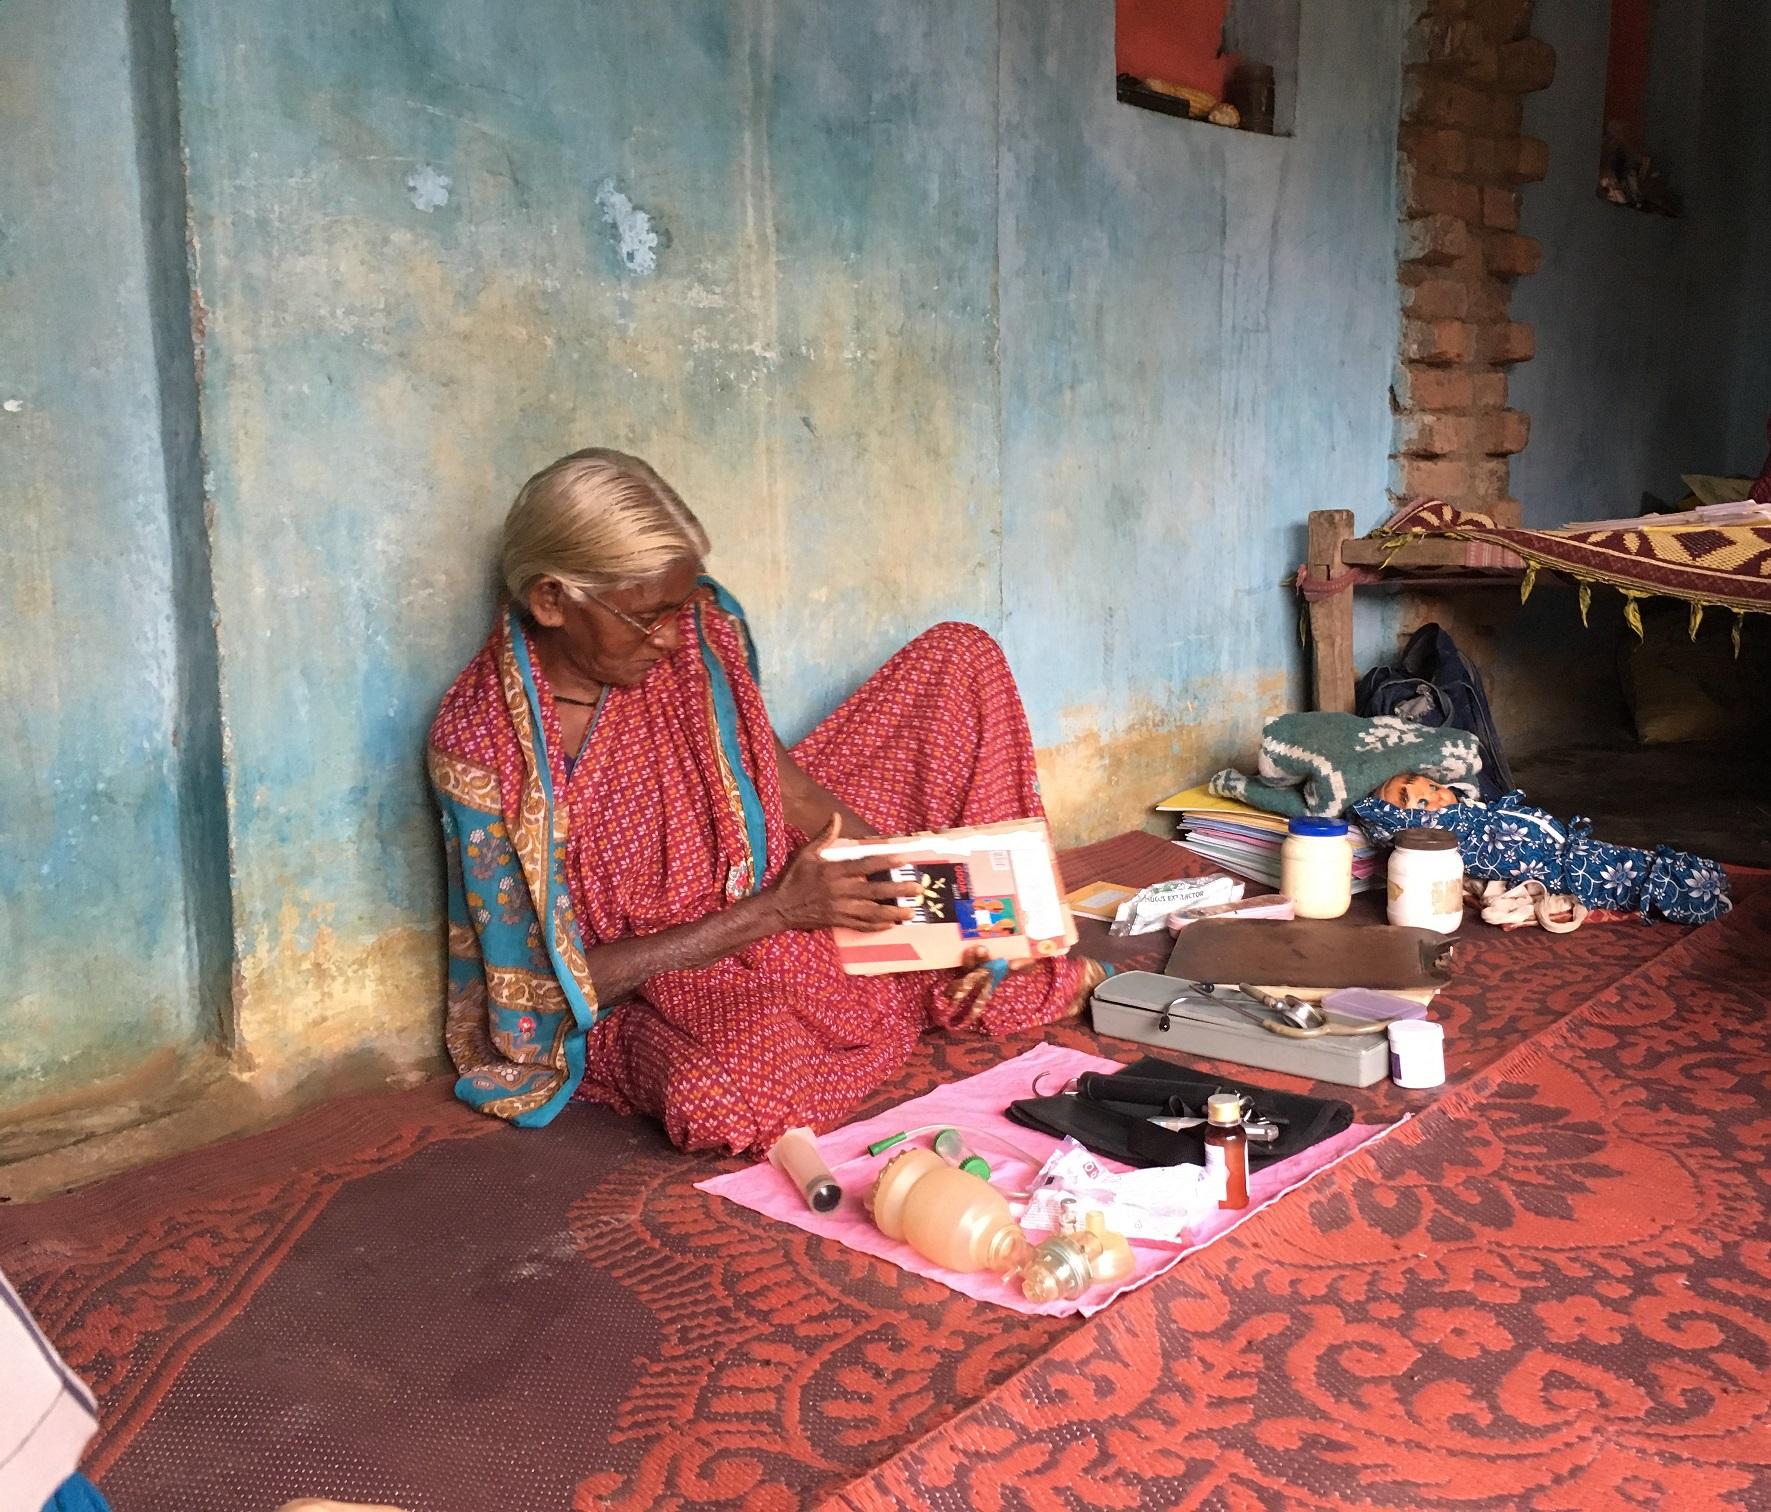 An Adivasi woman with a medical kit